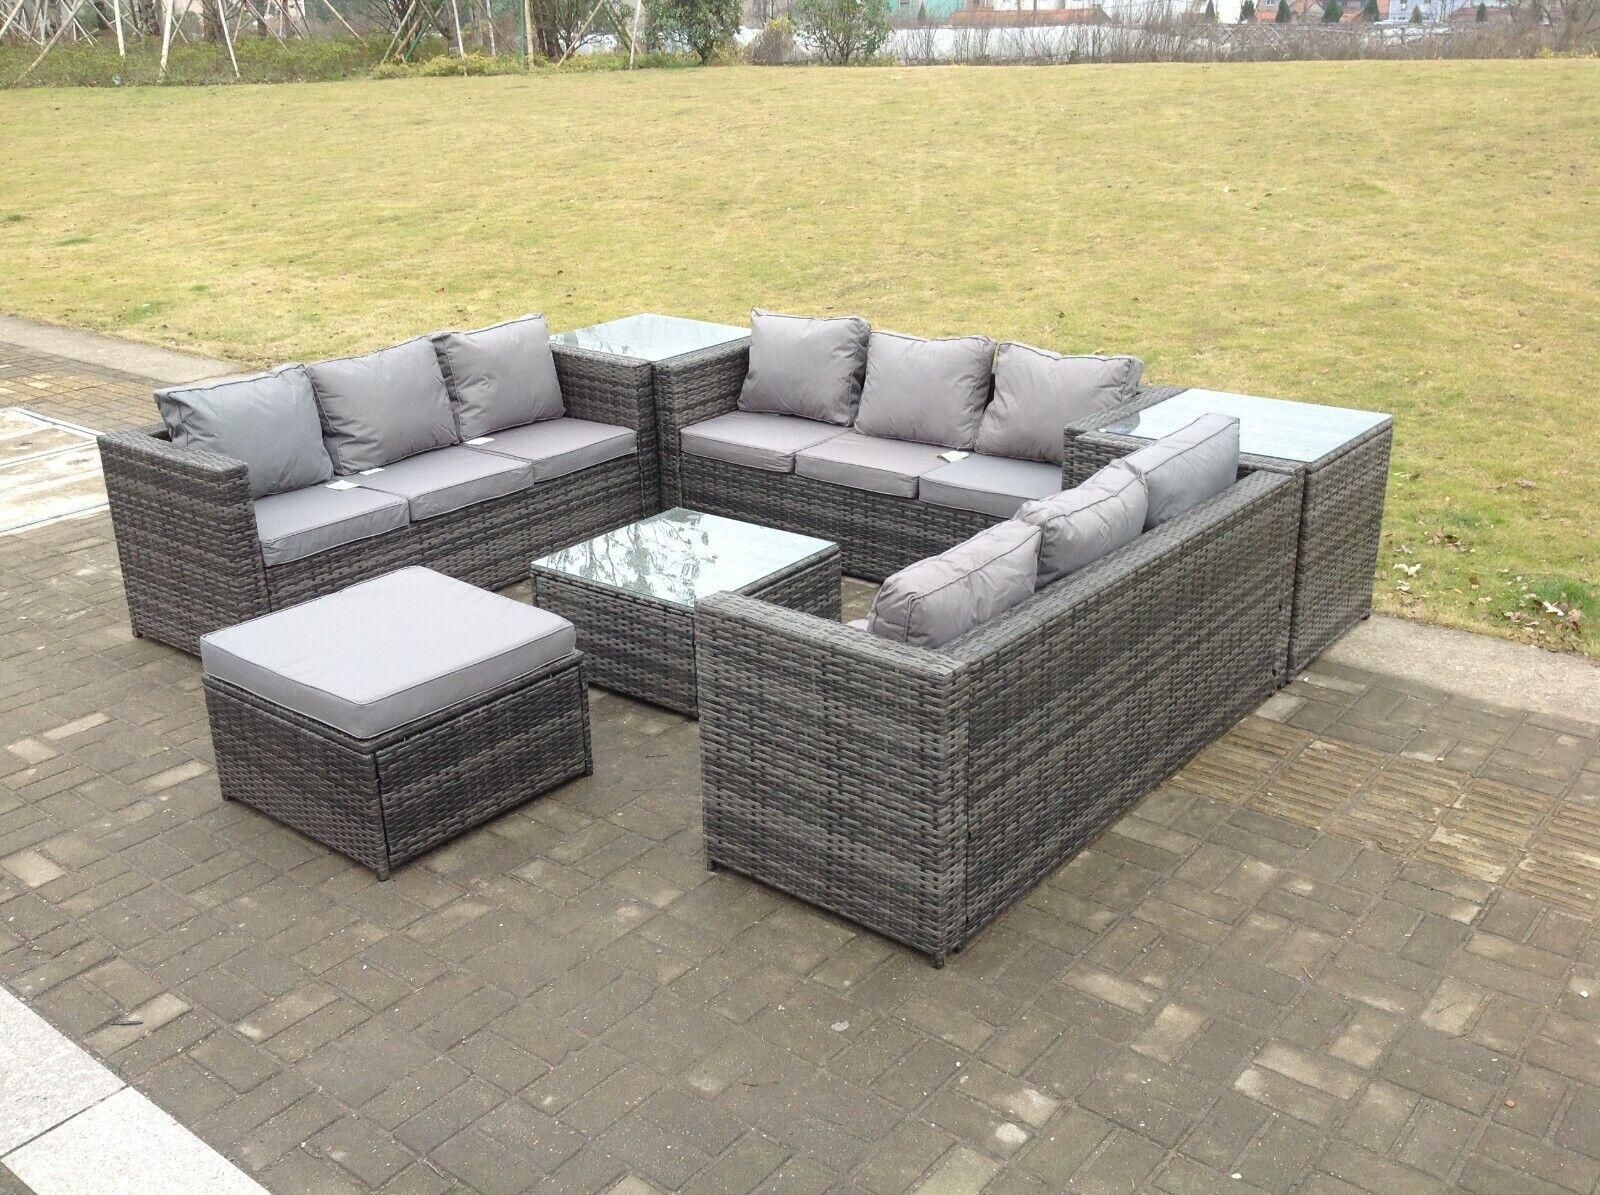 6 seater U shape rattan sofa set table outdoor garden furniture patio grey